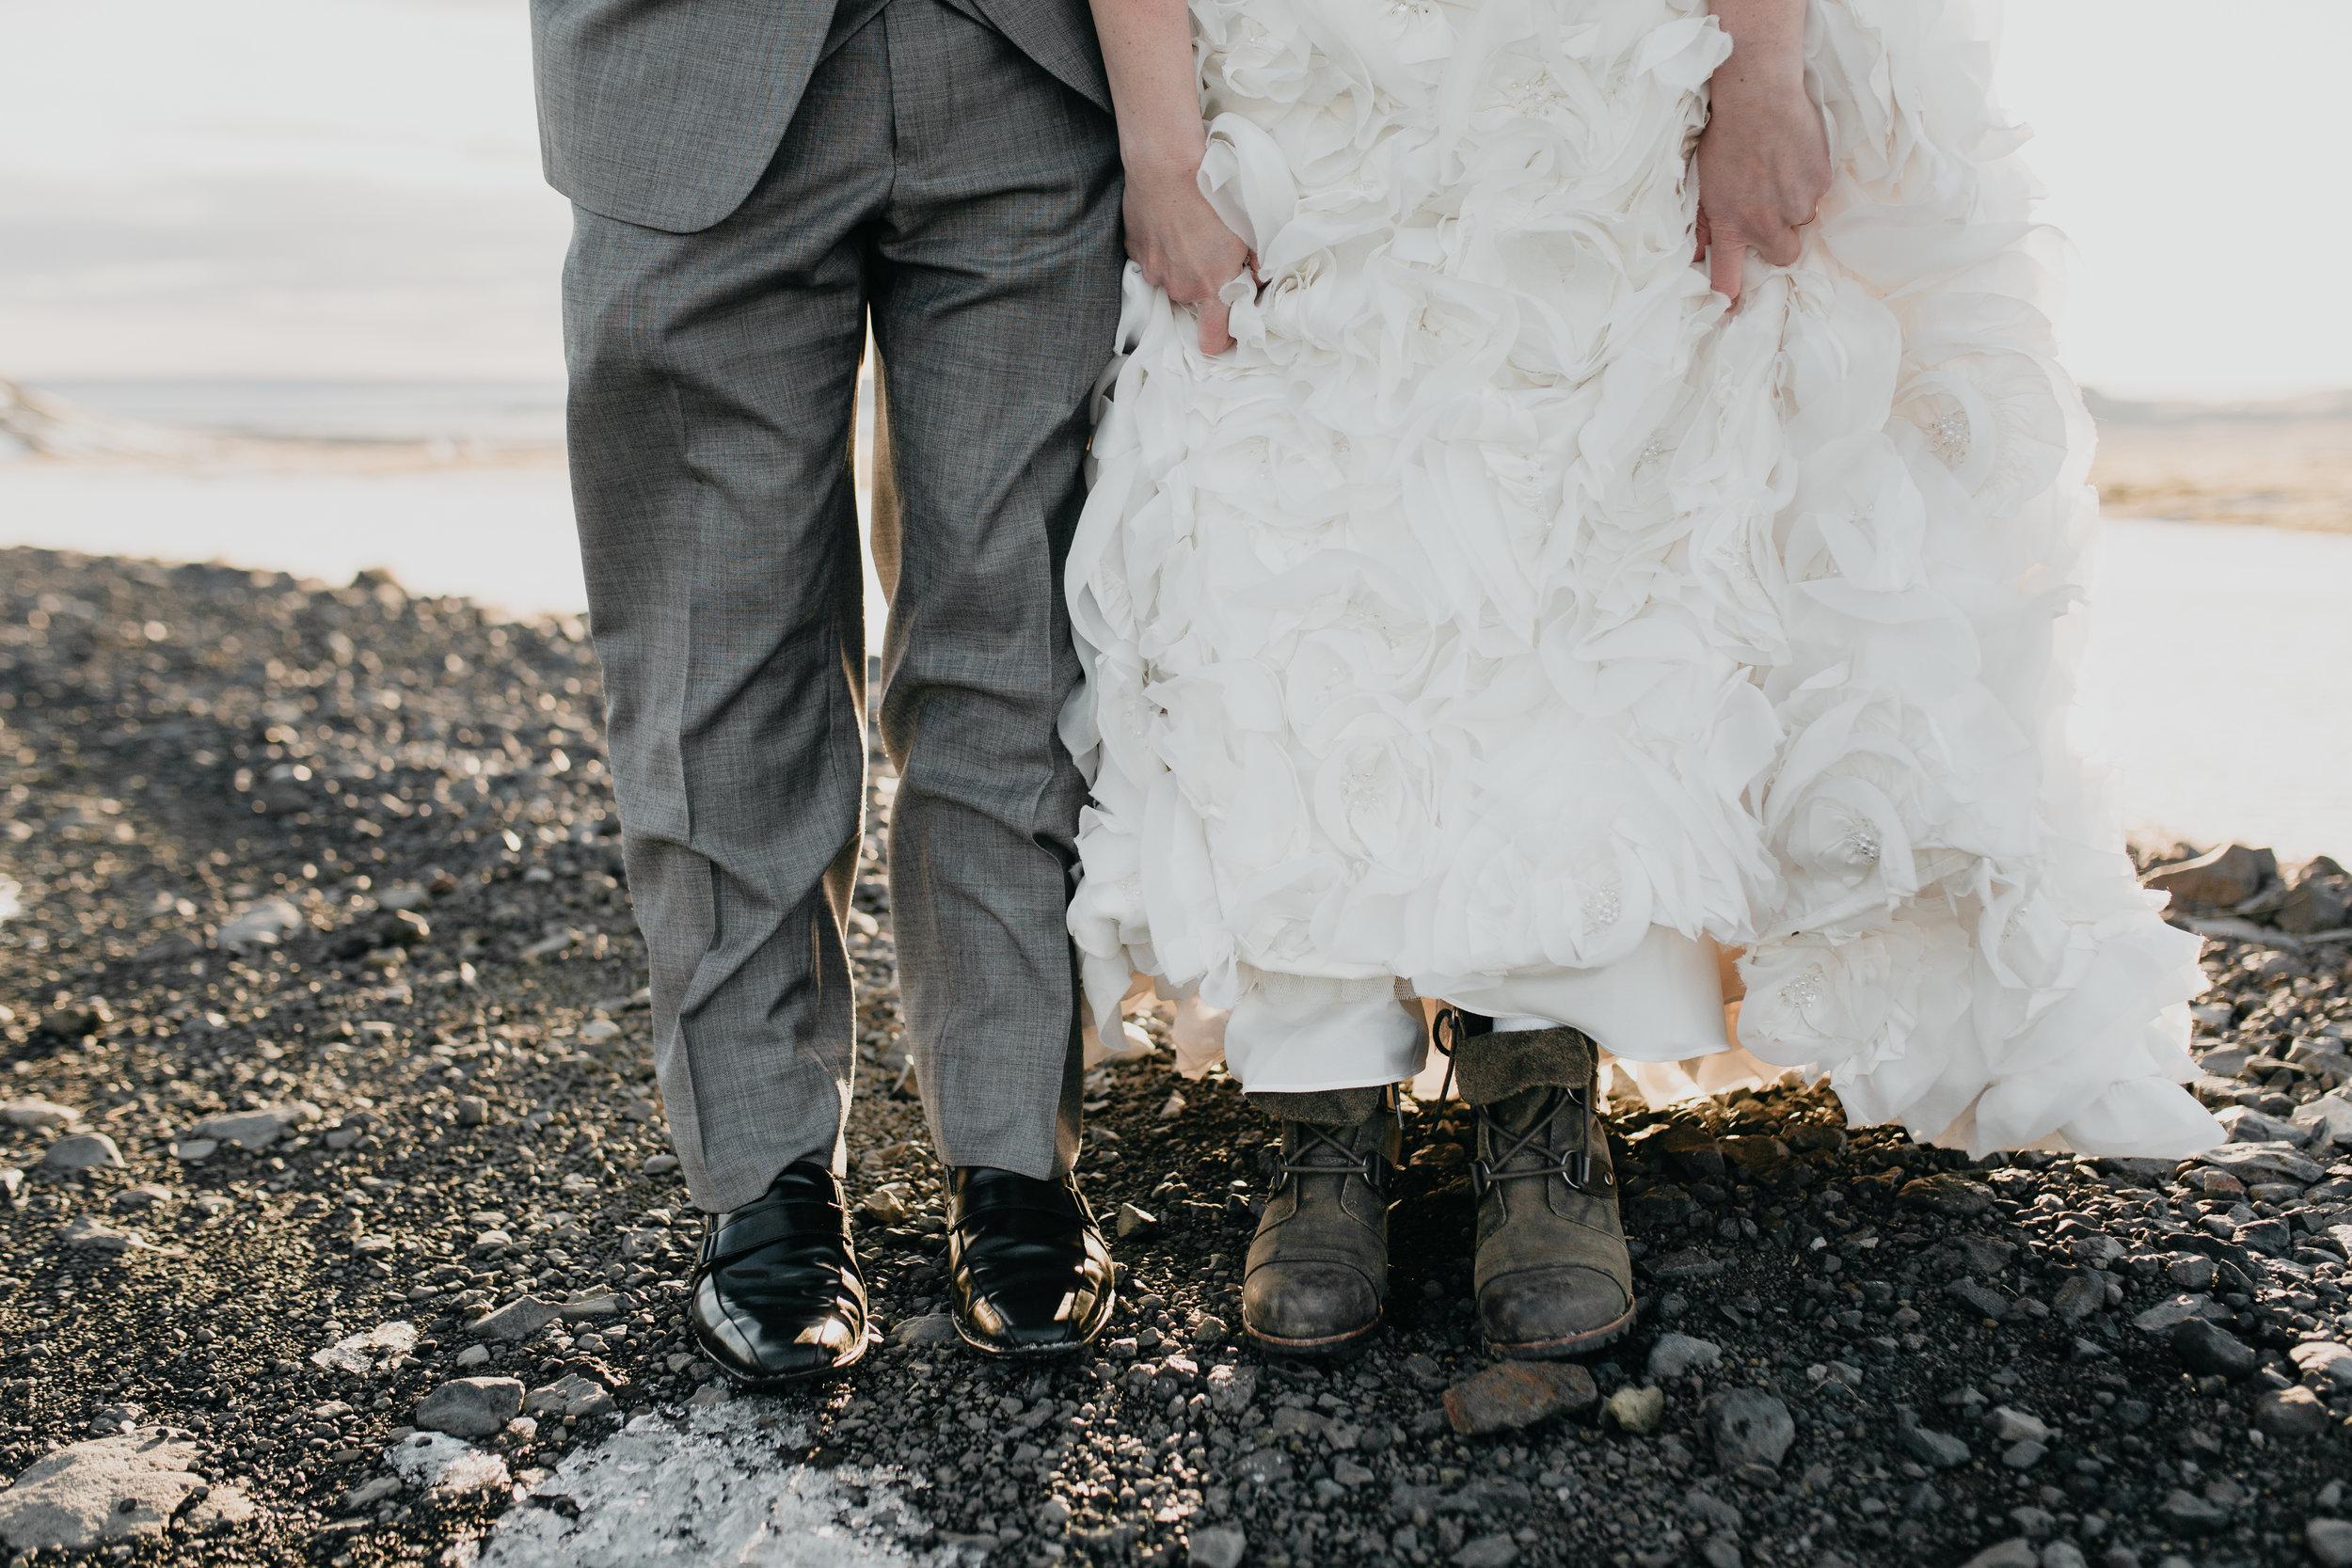 nicole-daacke-photography-iceland-winter-sunset-adventure-elopement-skogafoss-waterfall-black-sand-beach-dyrholaey-vik-iceland-intimate-wedding-black-church-elopement-photographer-21.jpg